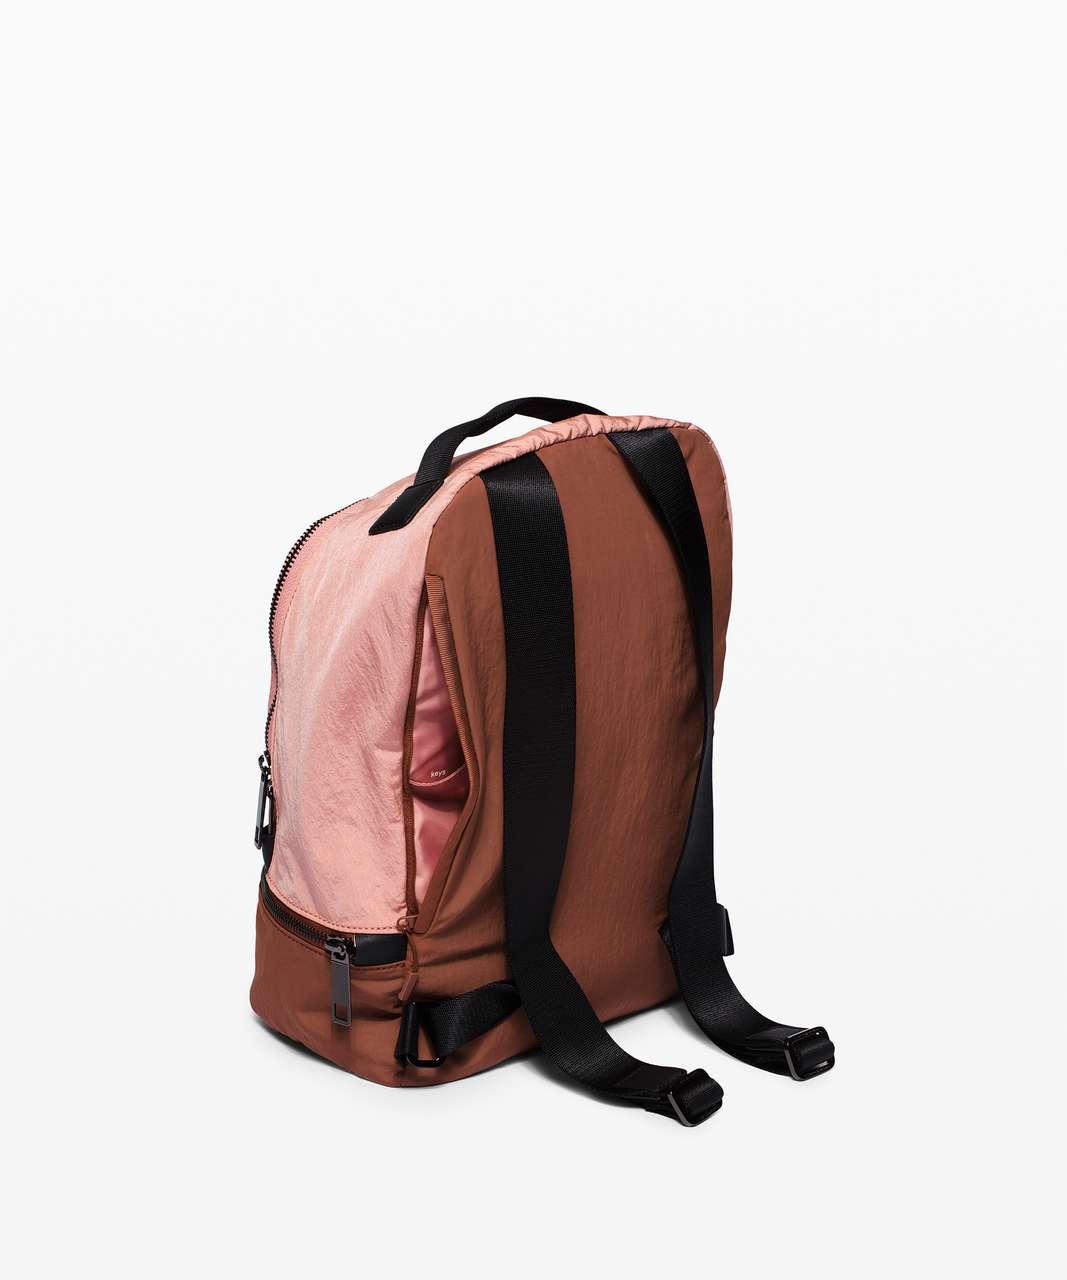 Lululemon City Adventurer Backpack Mini *10L - Pink Pastel / Ancient Copper